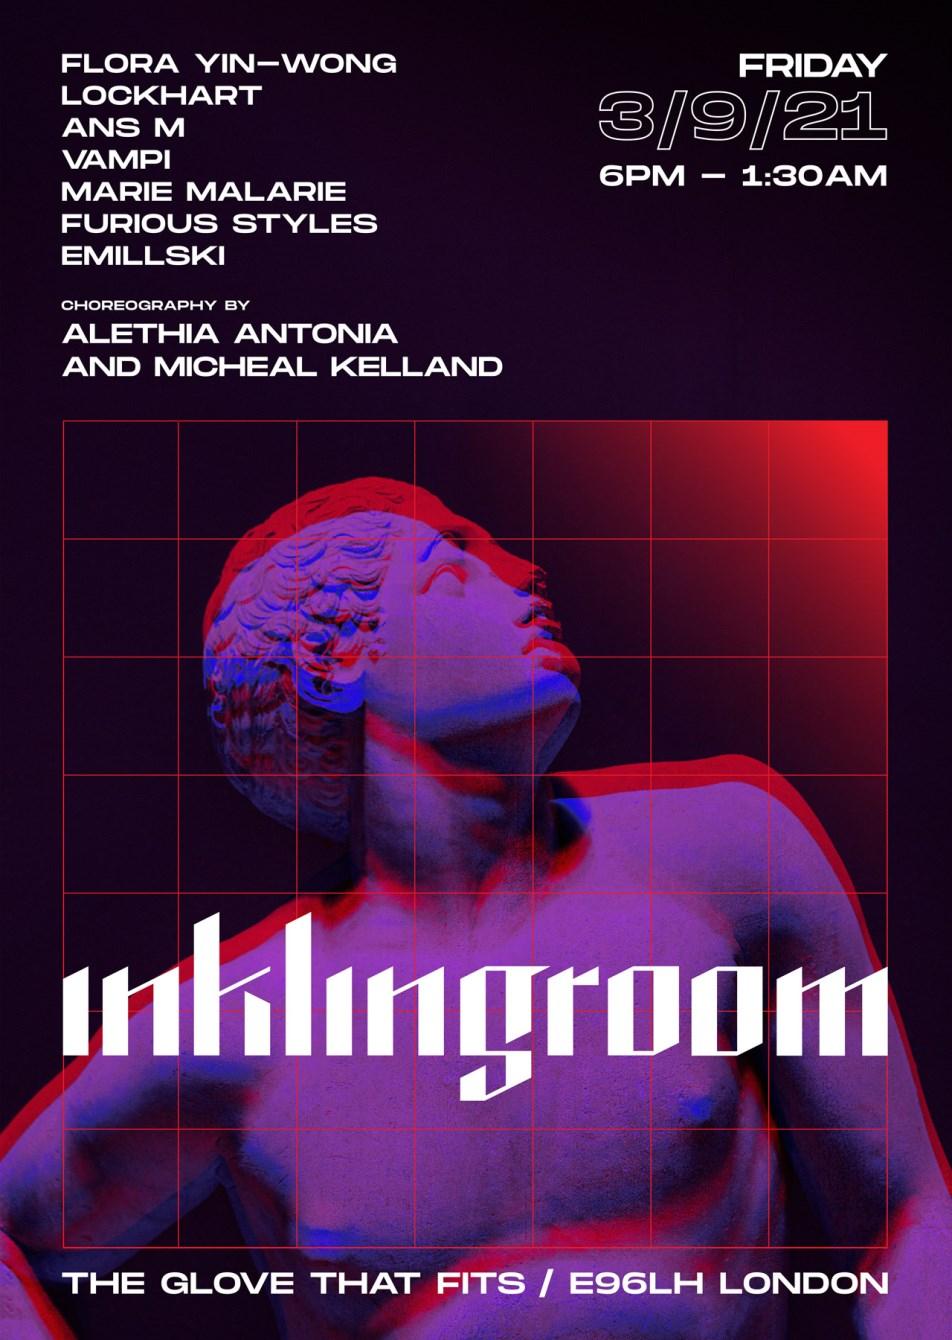 inklingroom with Flora Yin-Wong, Lockhart, Ans M, Vampi & More - Flyer front